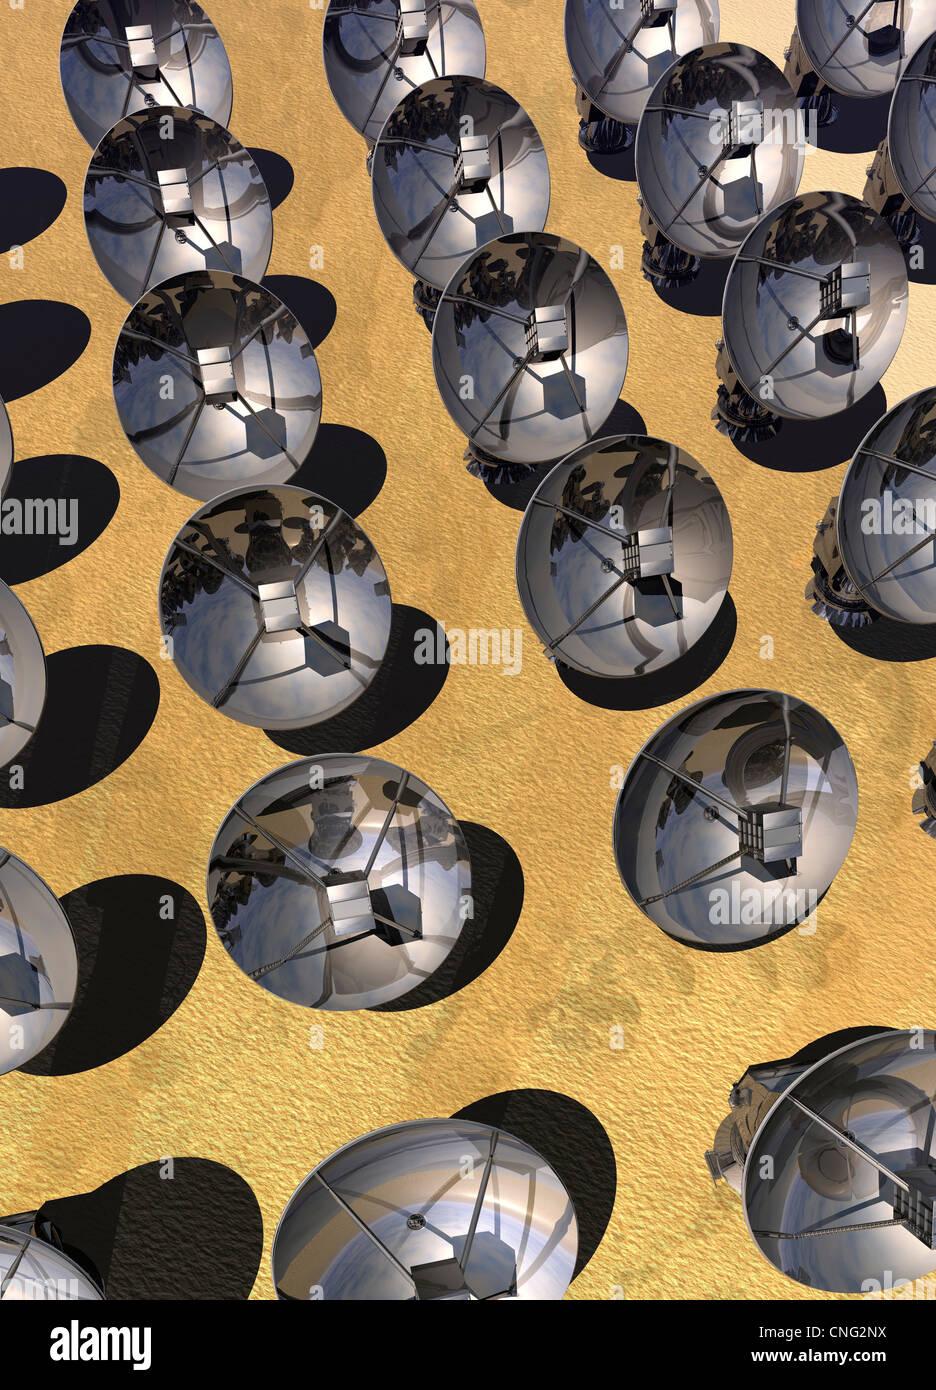 Array Satellite artwork Immagini Stock